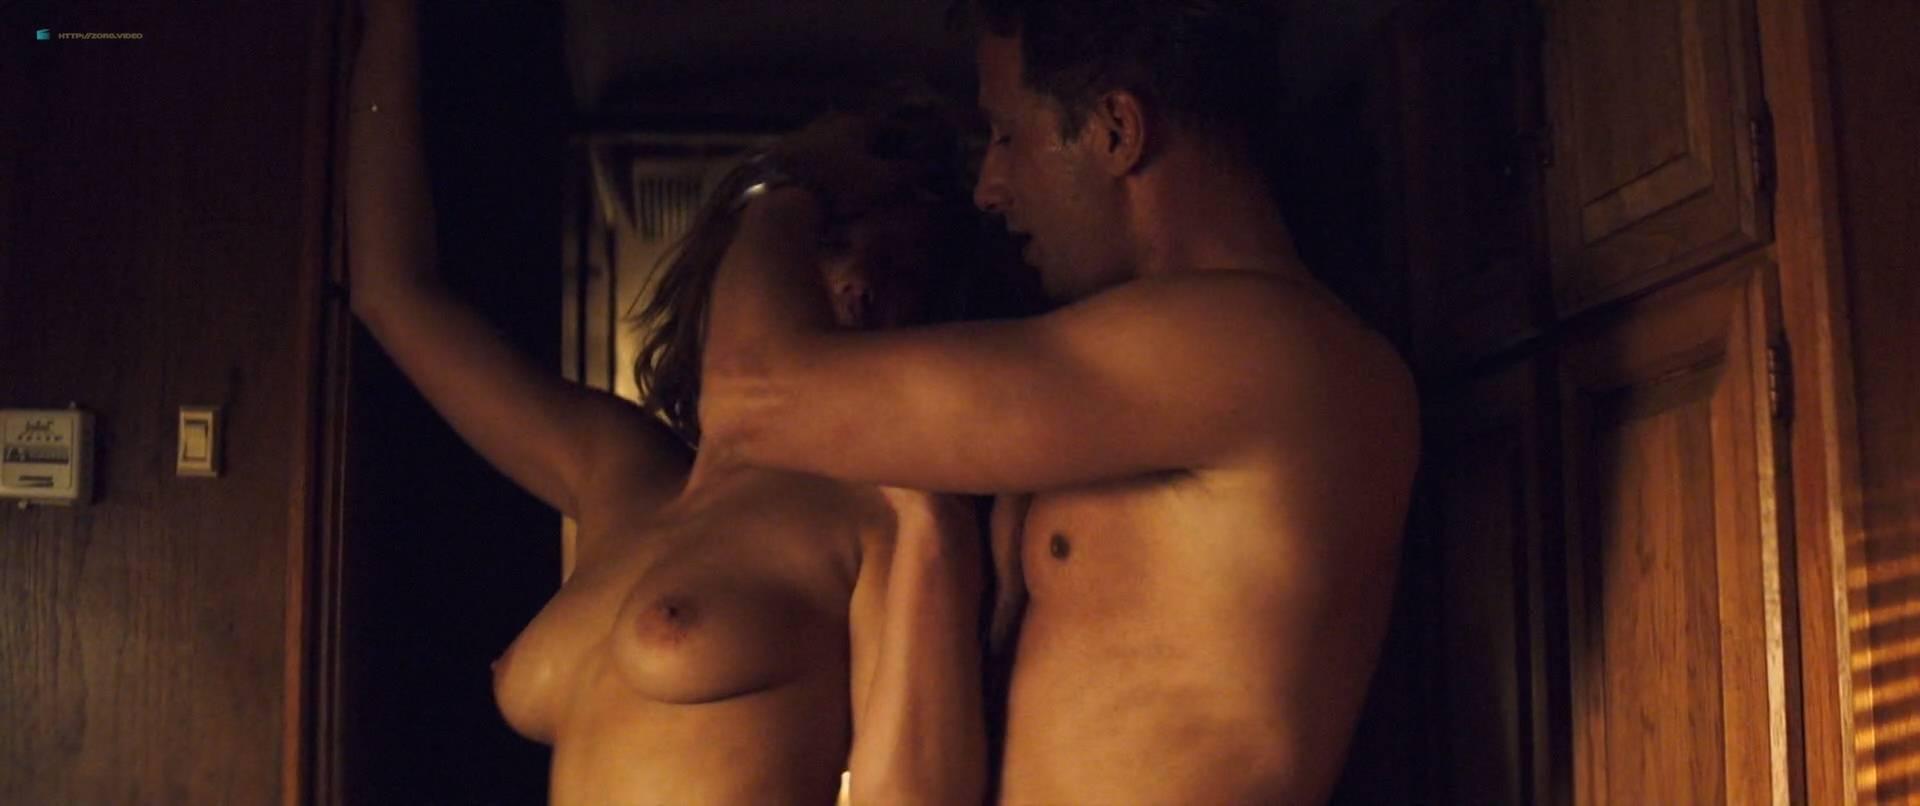 Adele exarchopoulos nude sex scene in le fidele 4